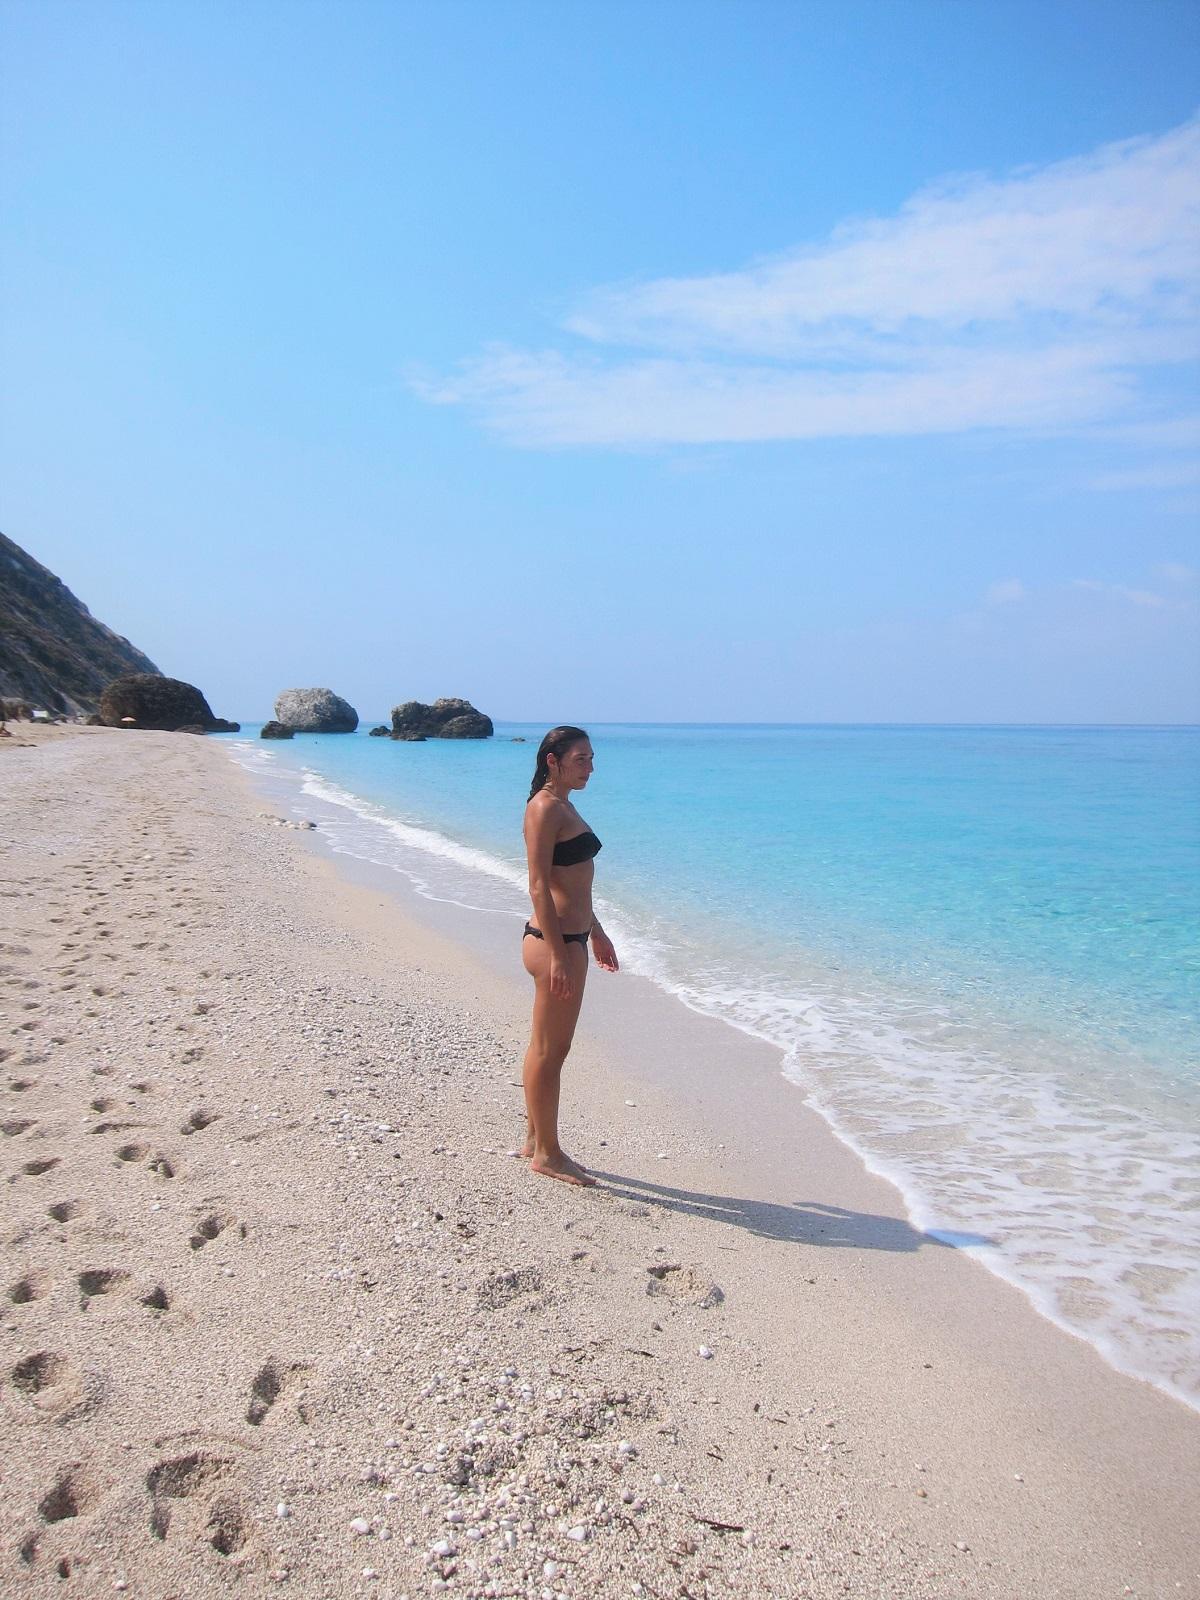 Lefkada Κavalikefta beach